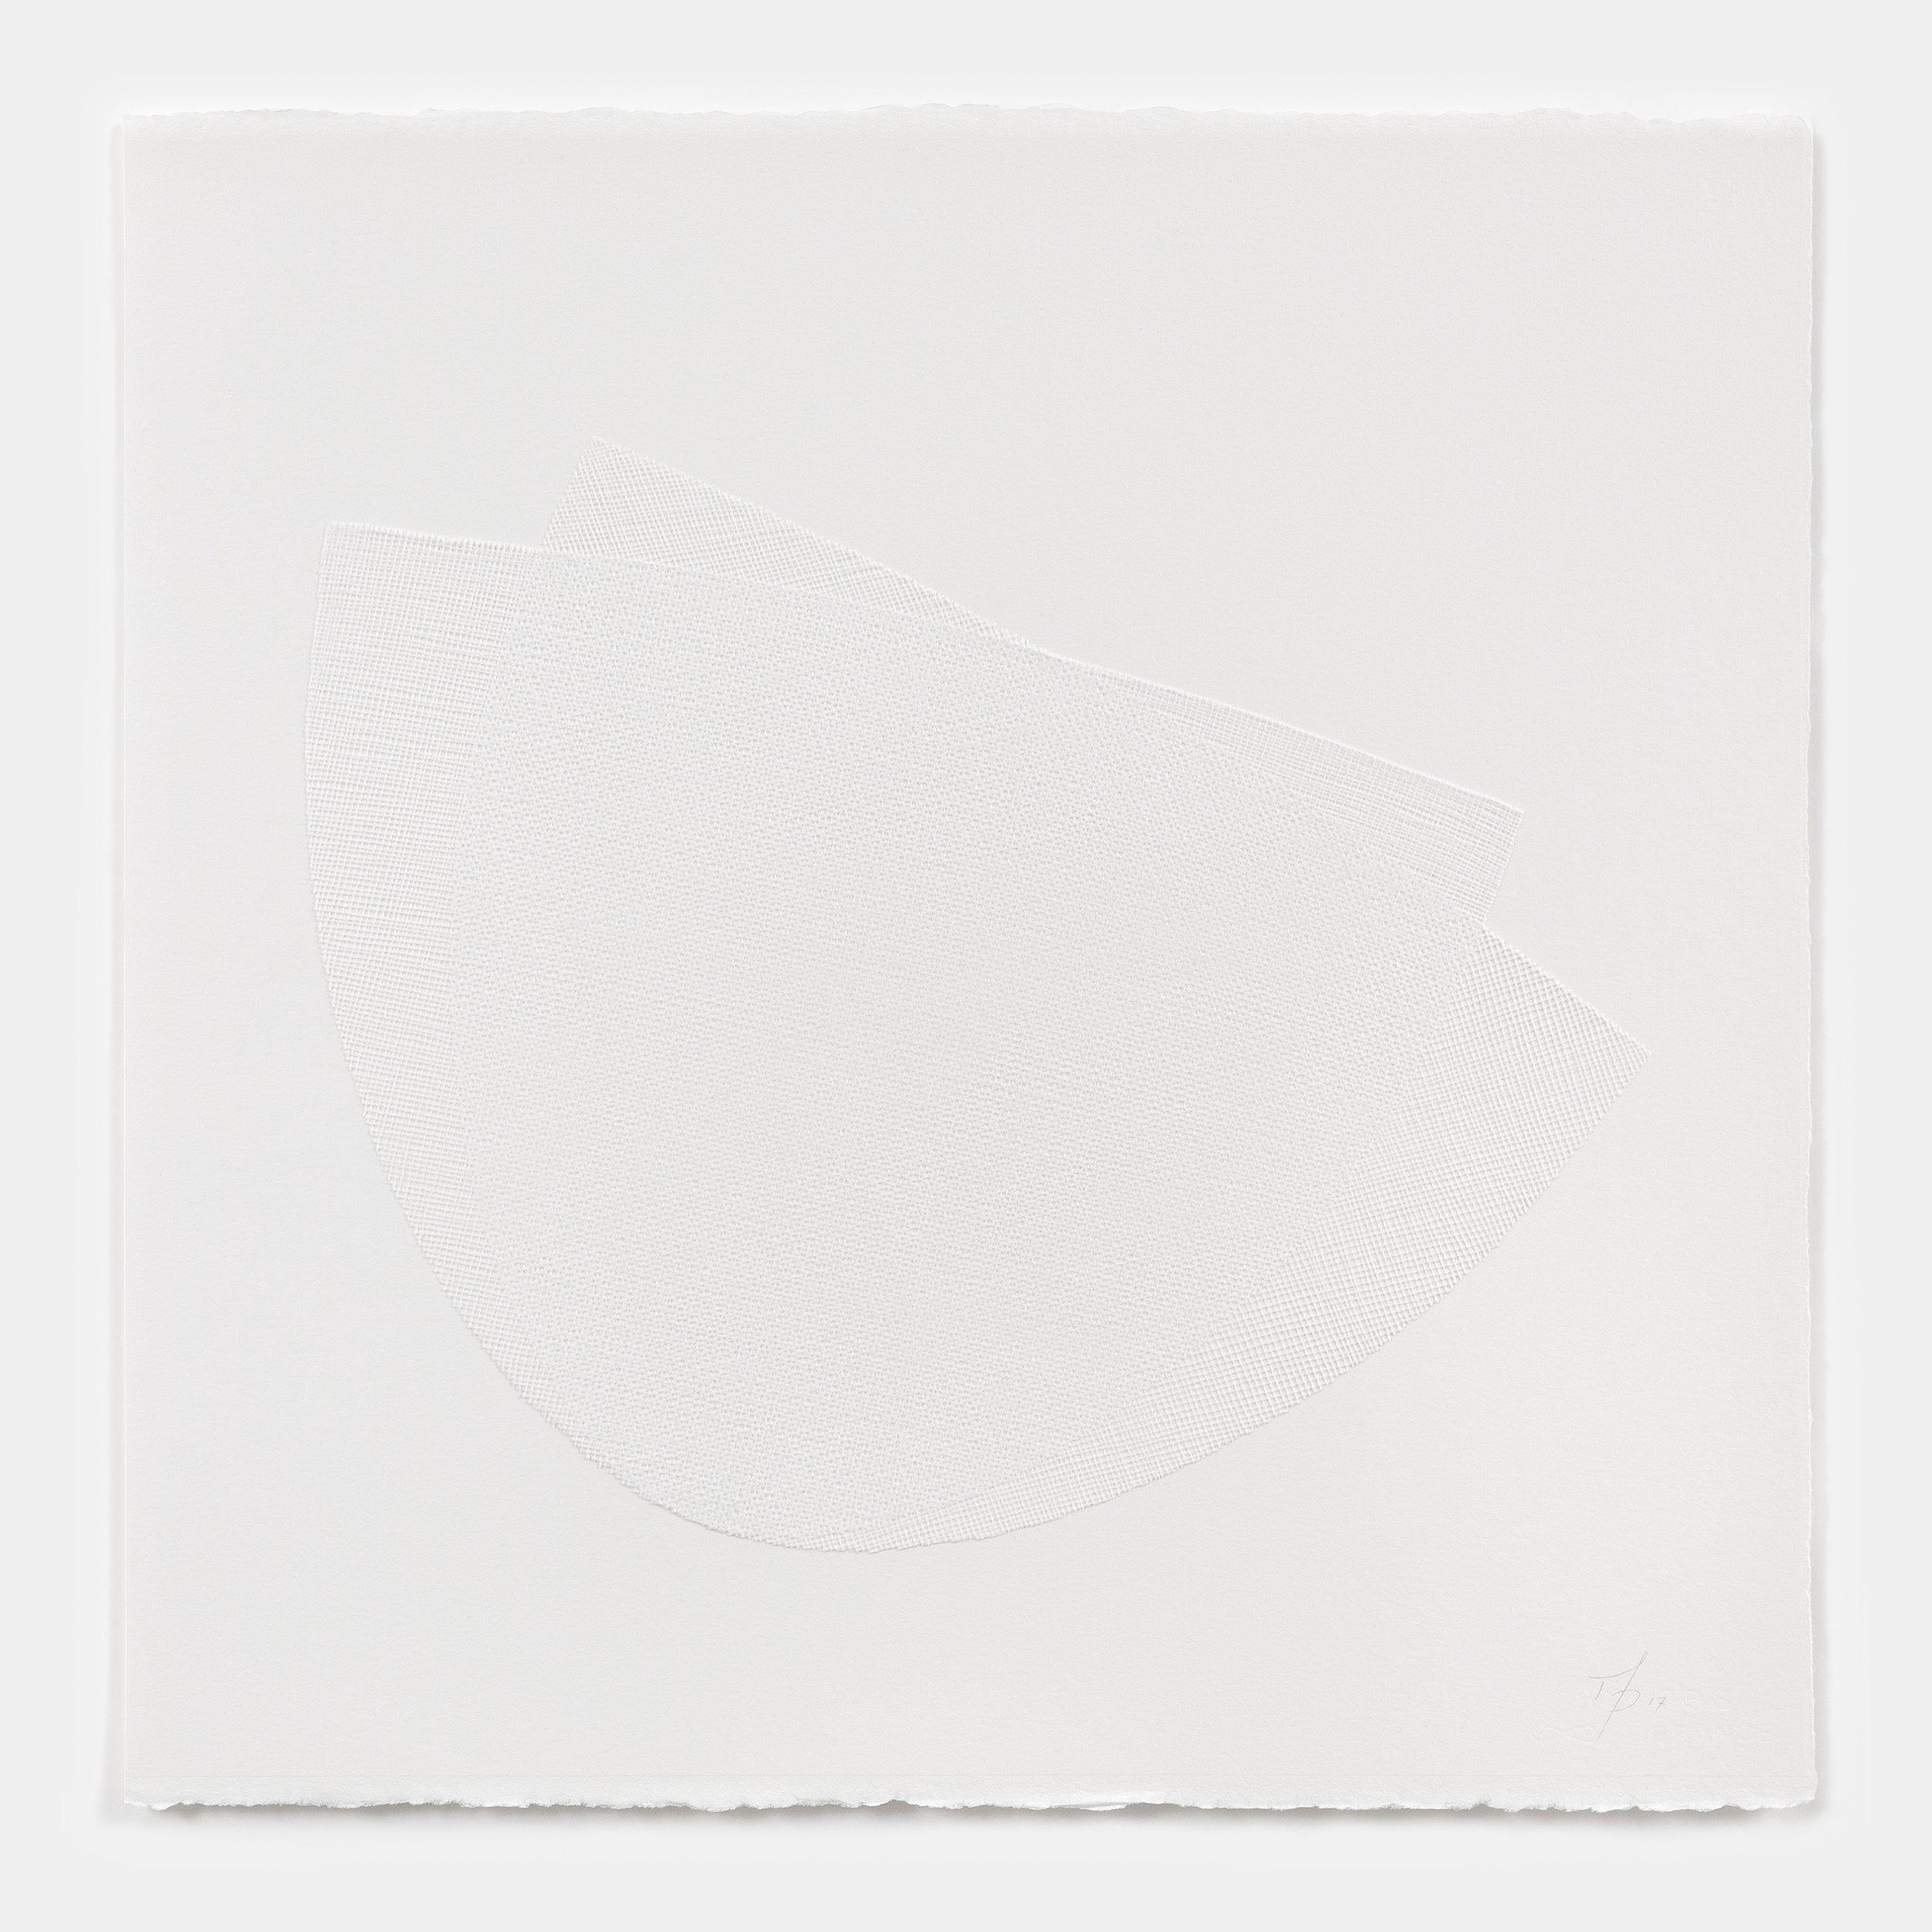 Mel Douglas, liminal I, 2017,fused glass, paper, 60 x 60 cm.Photos: David Paterson.